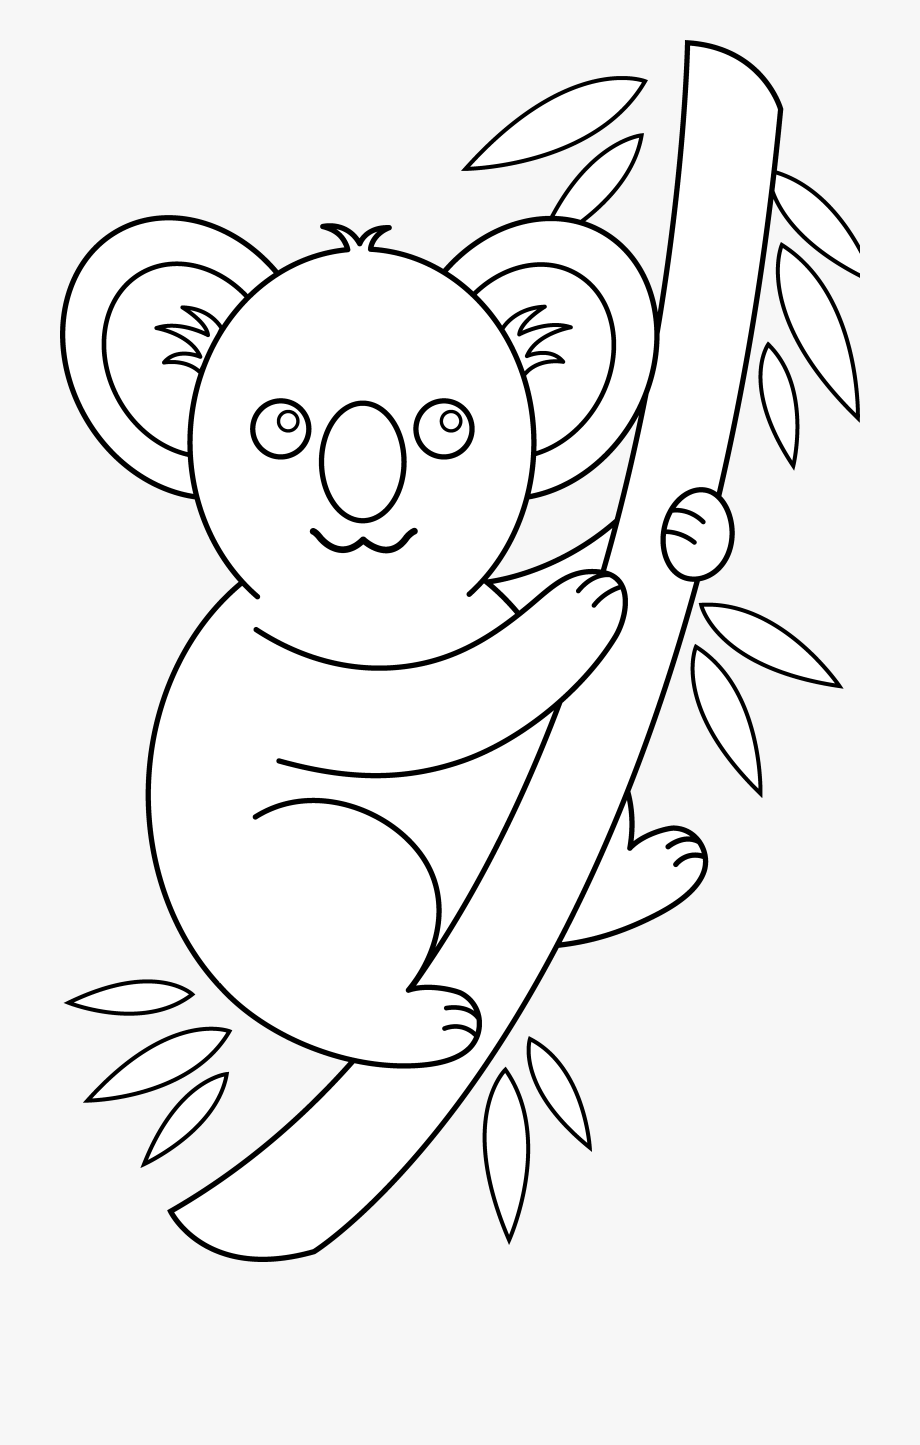 Koala Outline.